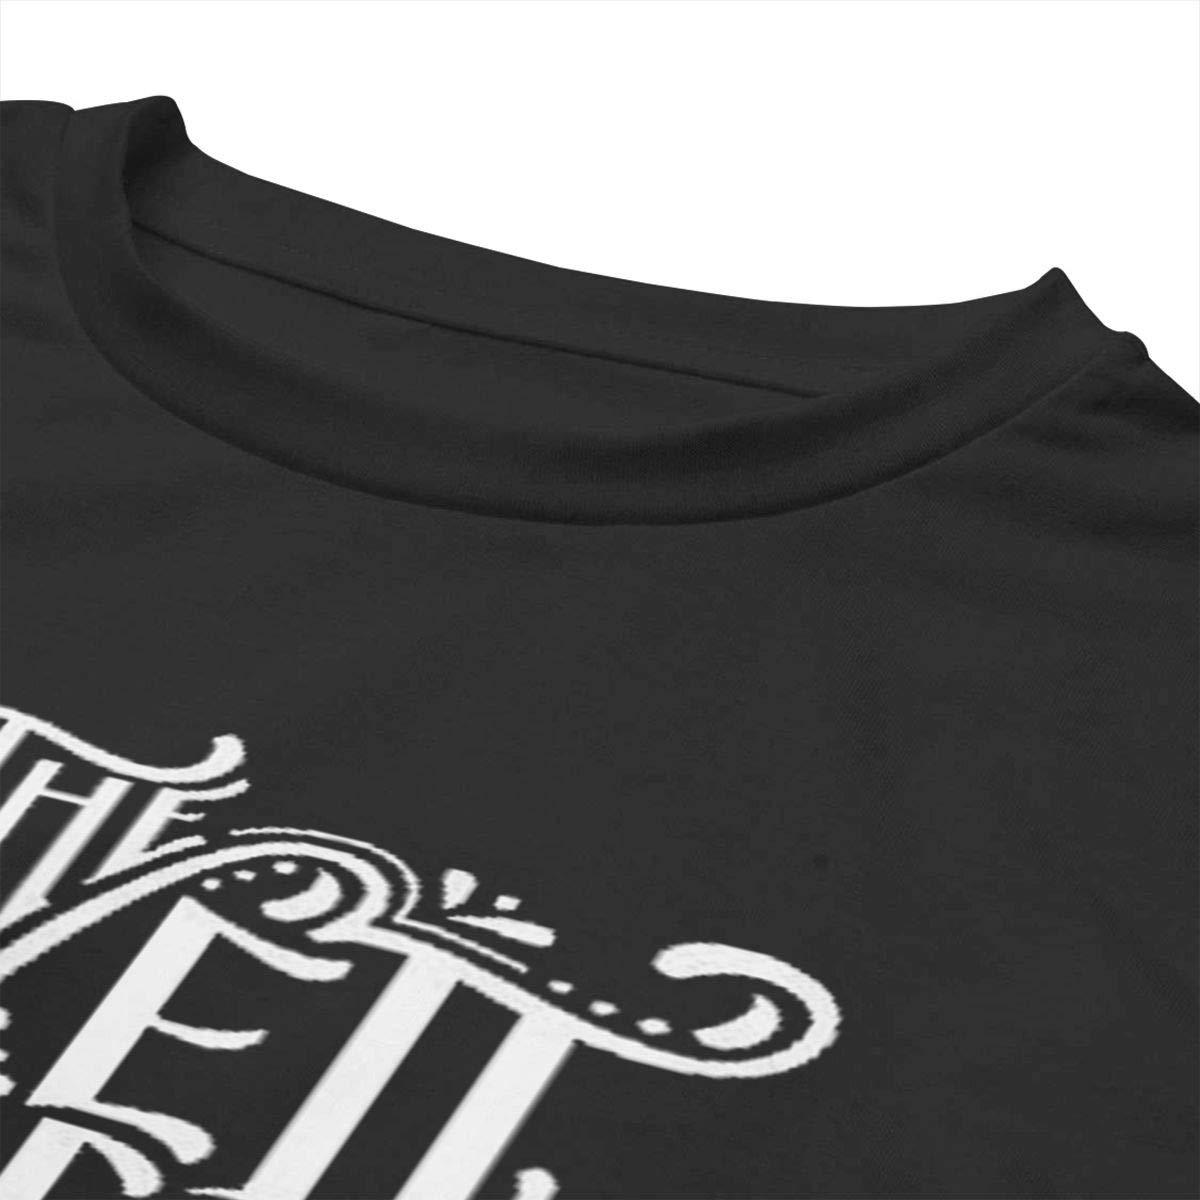 shenglv Womens Digital Print Crew Neck Pullover Sweatshirt